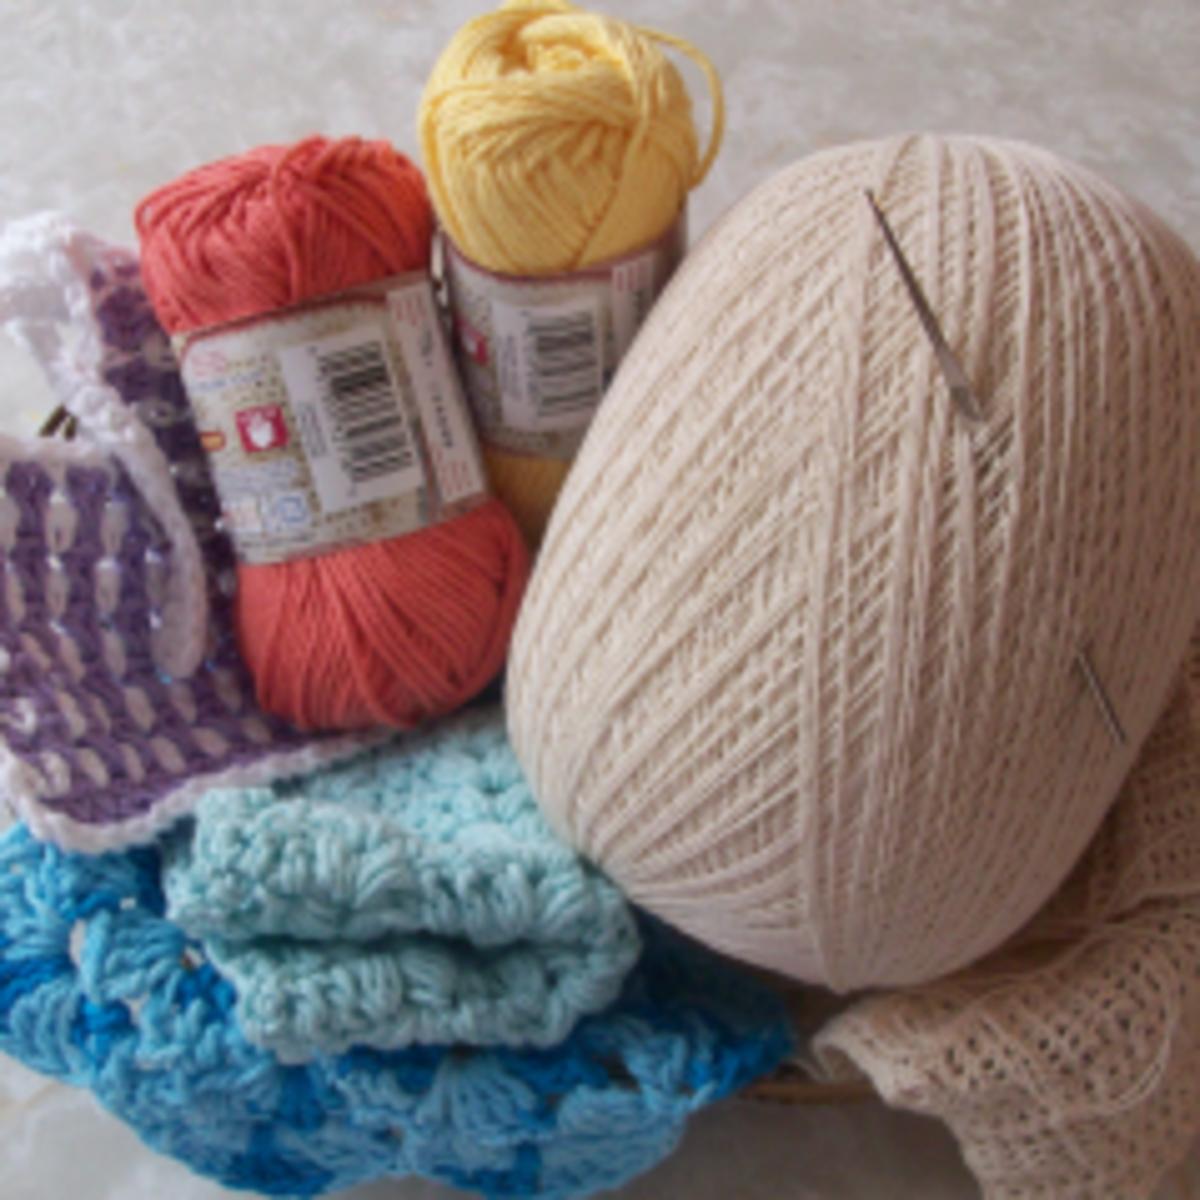 Crocheting Business : How to Start an Online Crochet Business